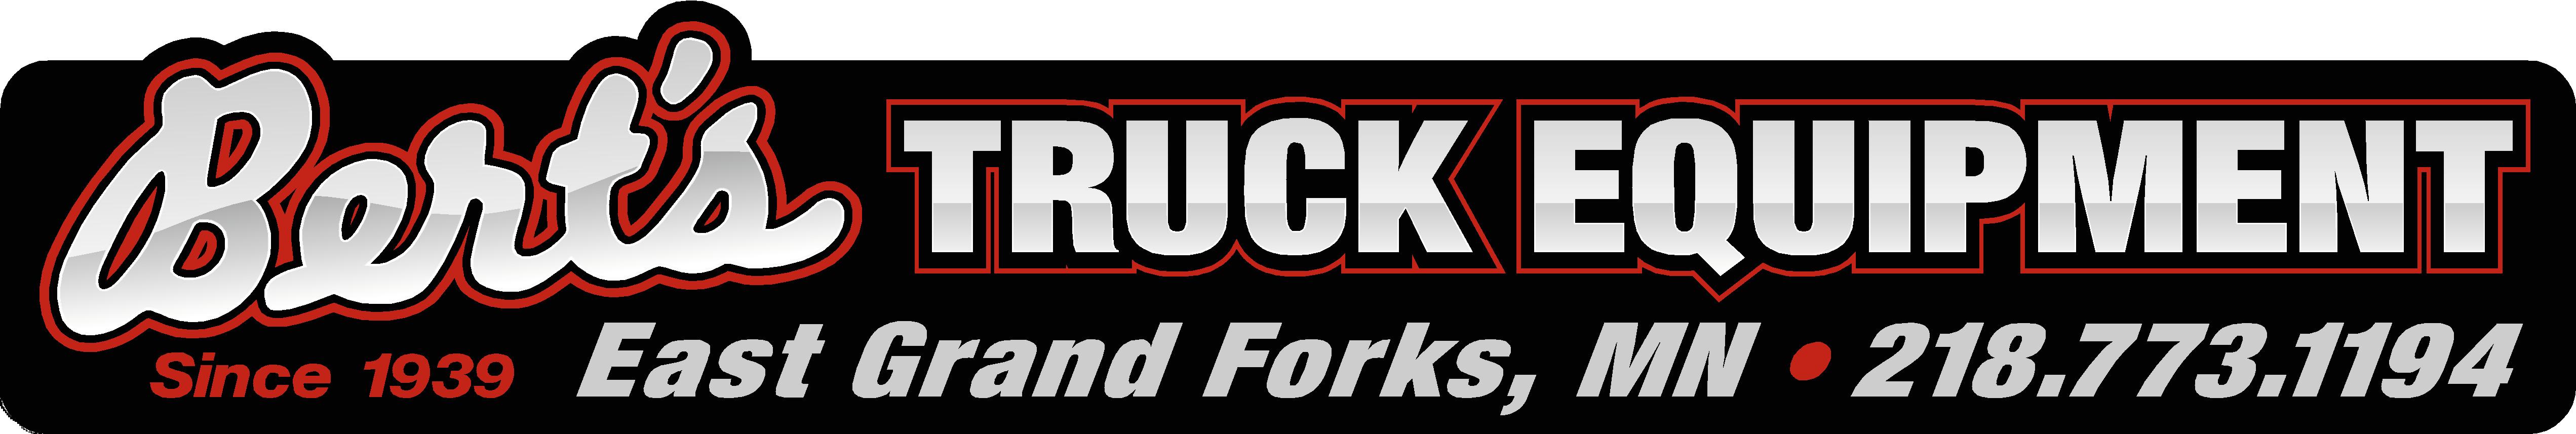 BERTS TRUCK EQUIPMENT Full Logo